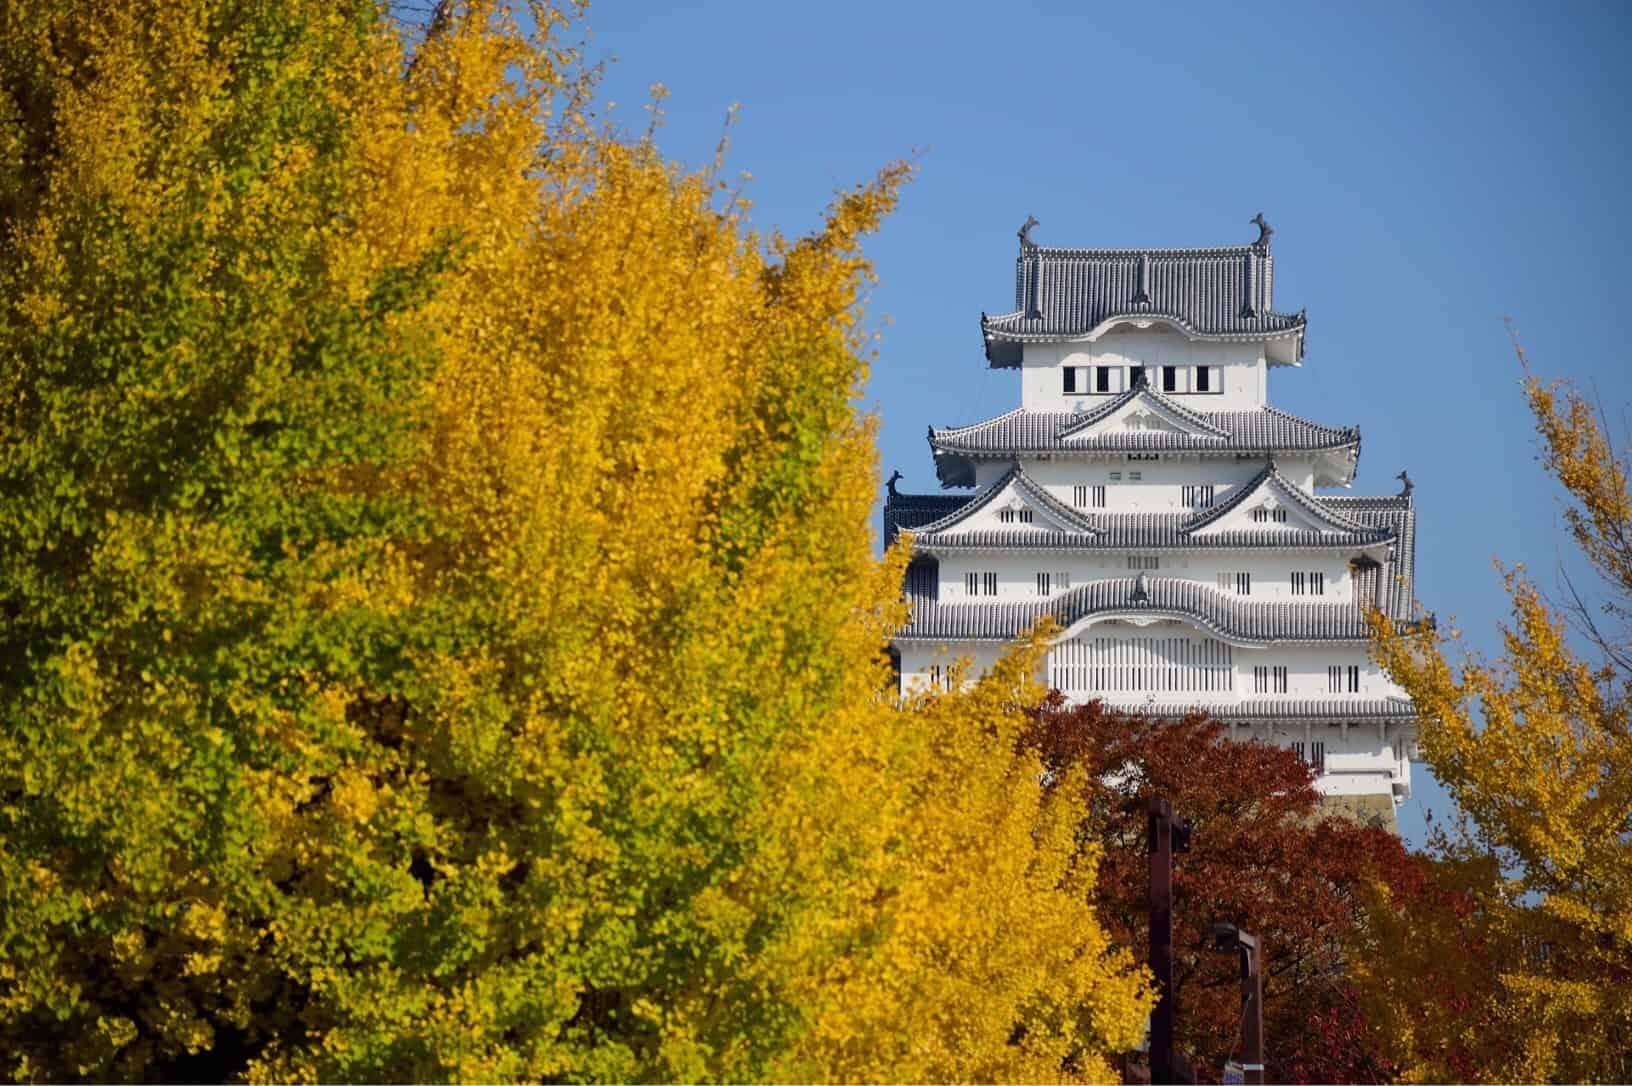 Things to see in Japan